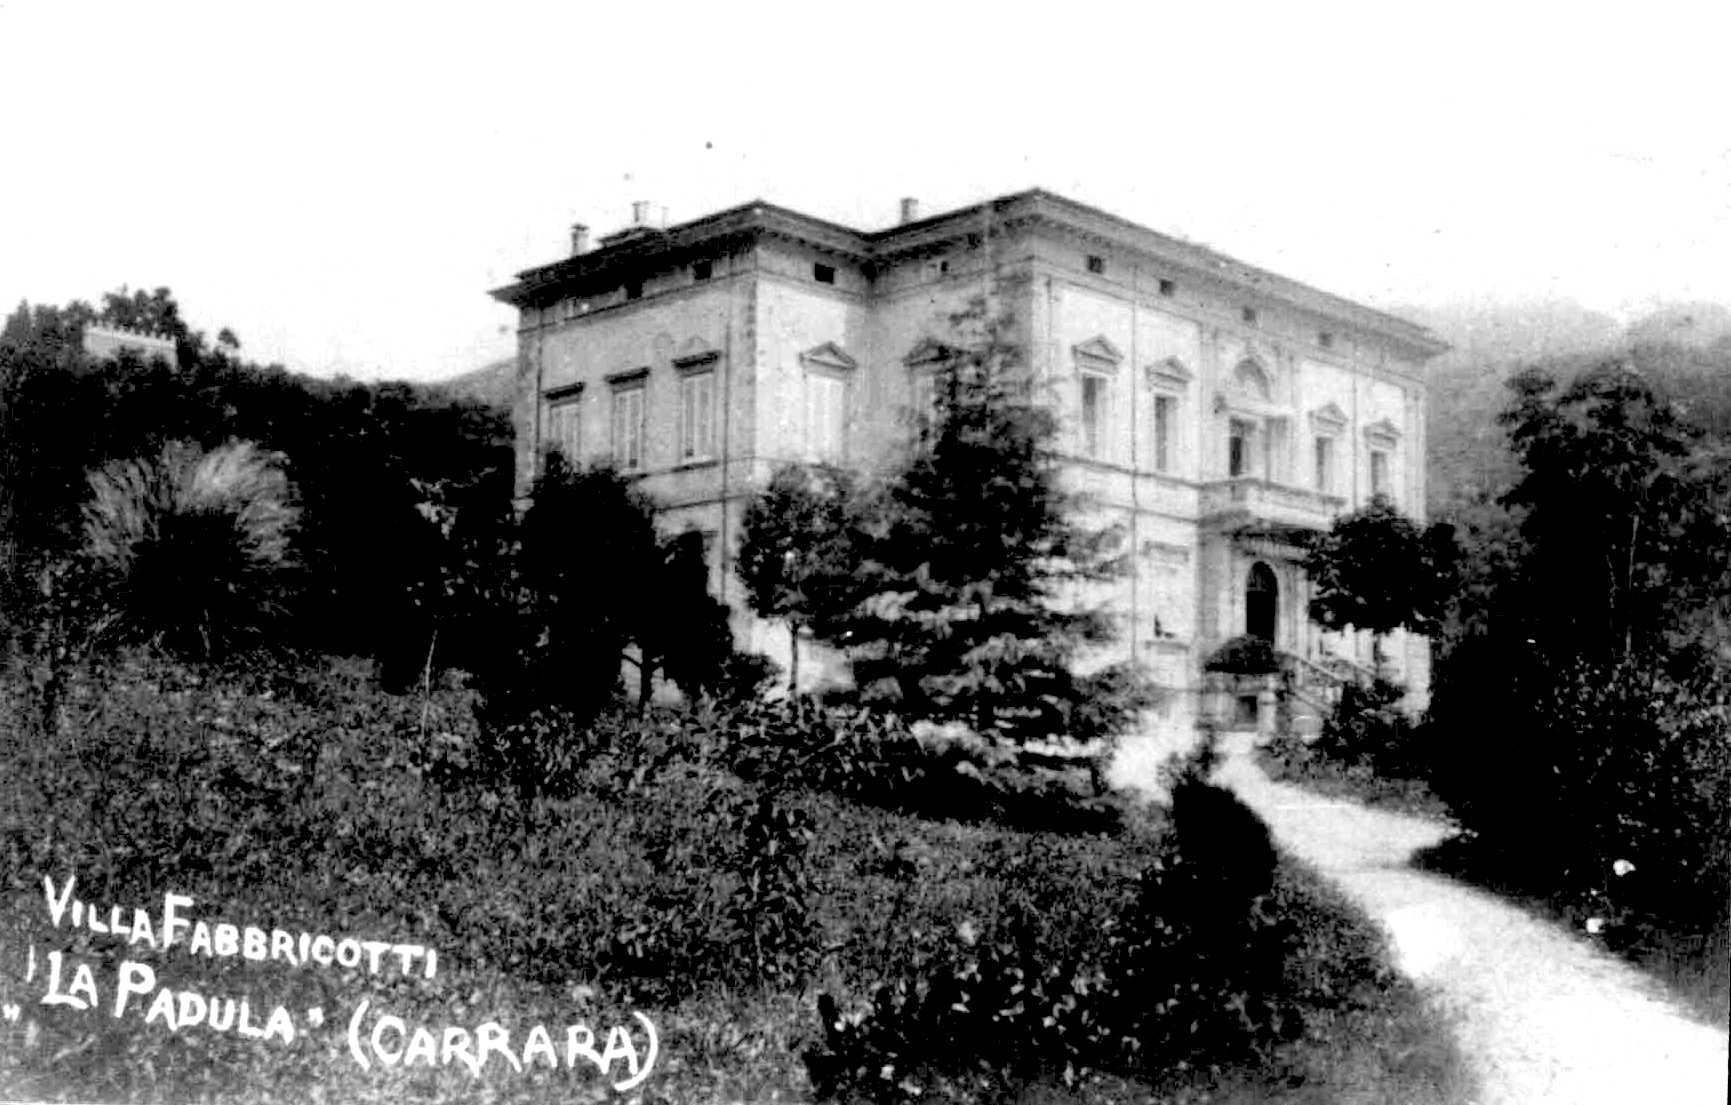 cp villa Fabbricotti alla padula